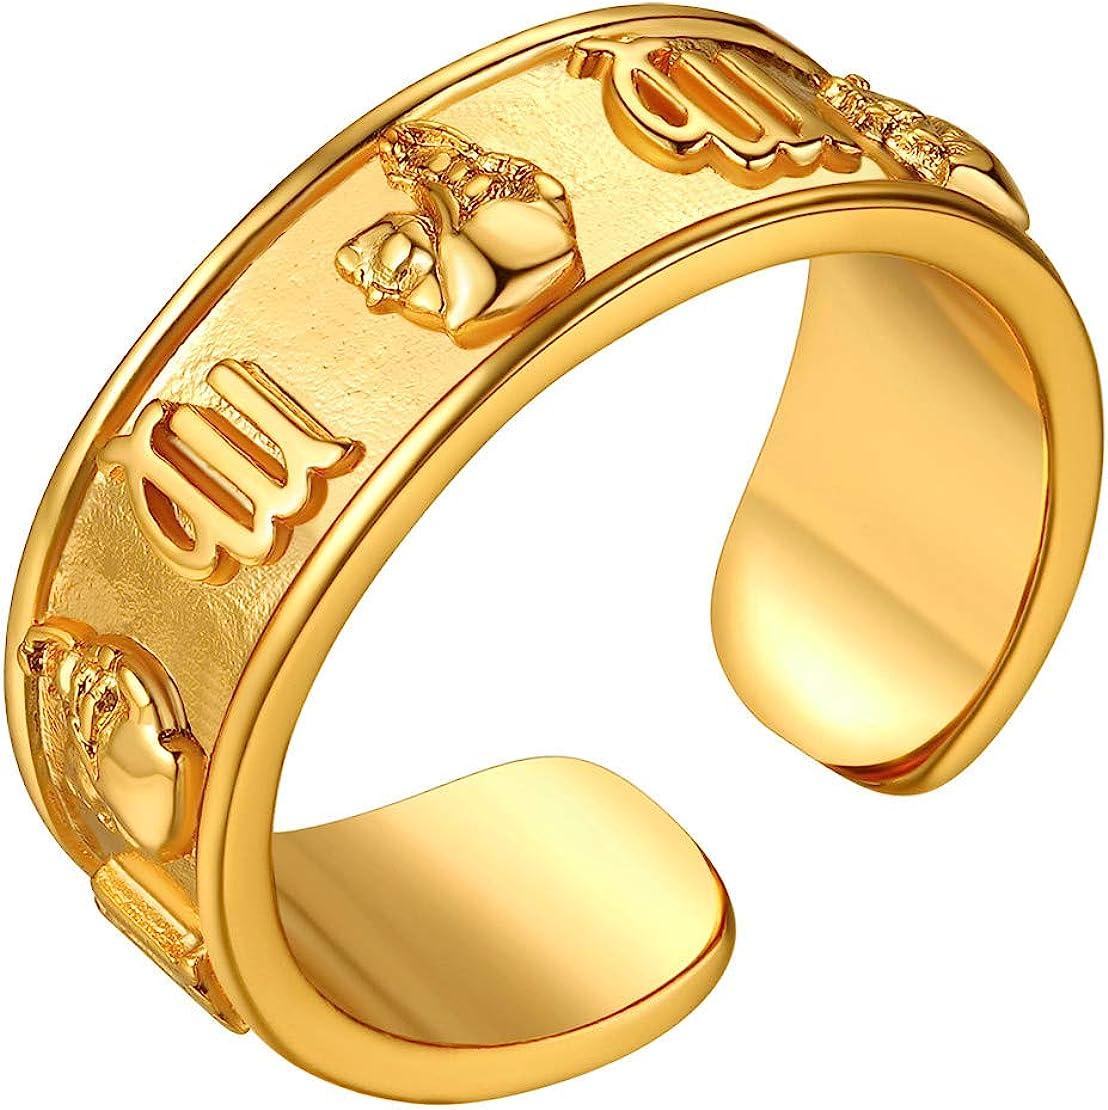 FindChic 3D Signos Zodíaco Anillos Ajustable de Oro baño Fino Tratado Mujeres Anillos Hombres con Estuche de Regalo